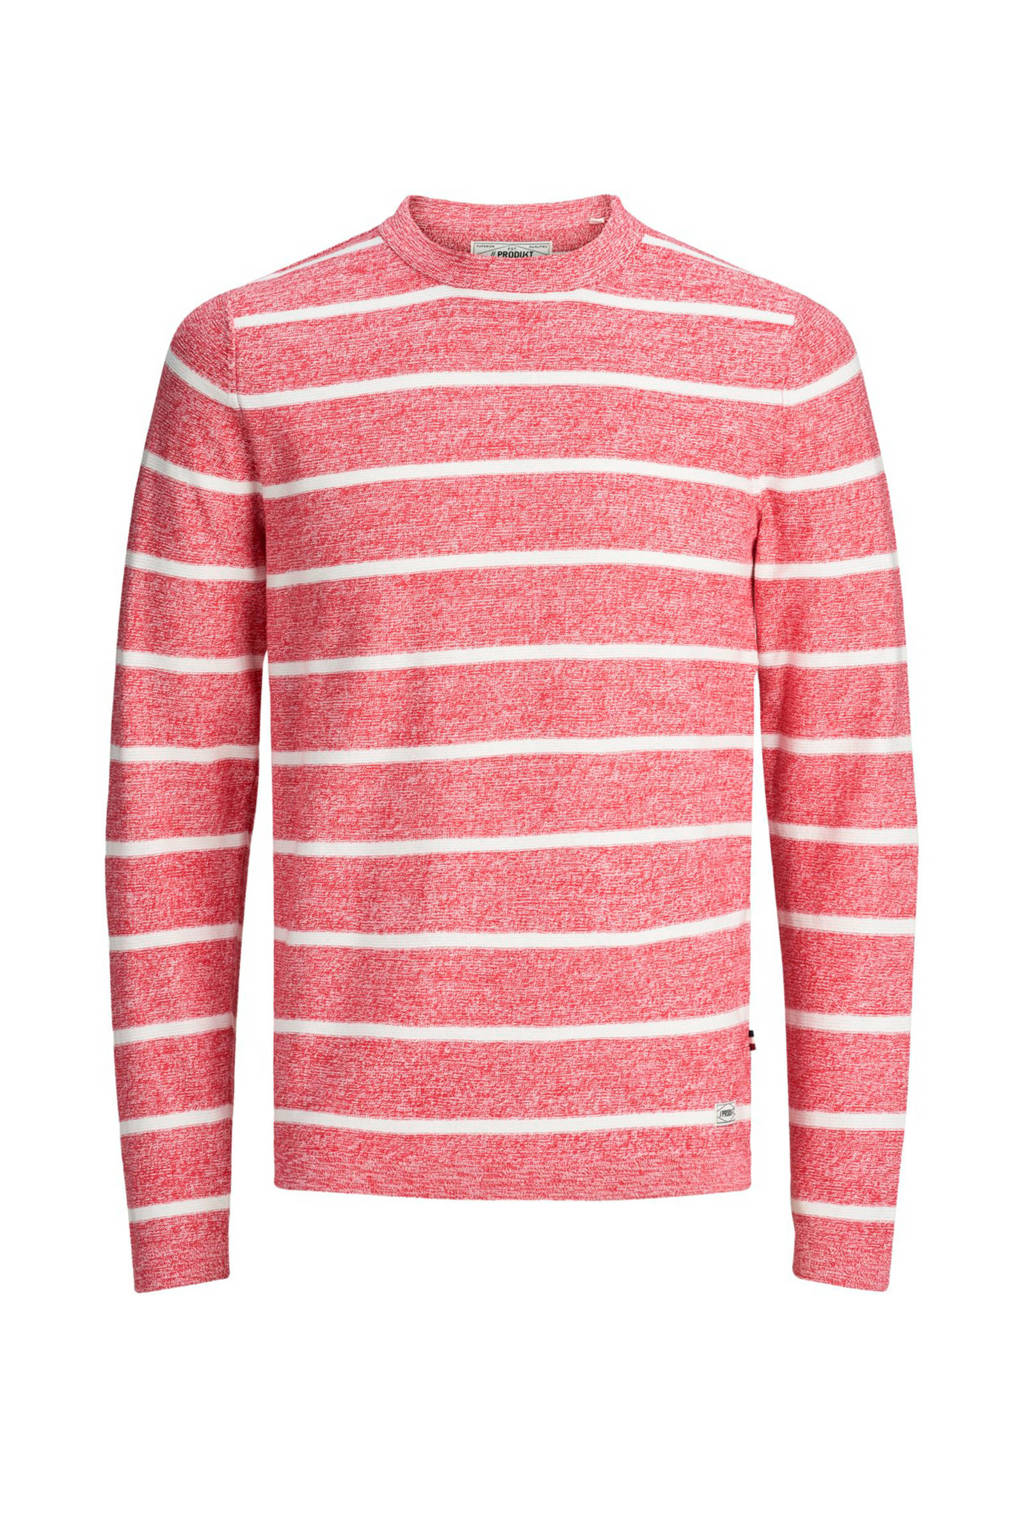 PRODUKT pullover met streep, Rood/wit